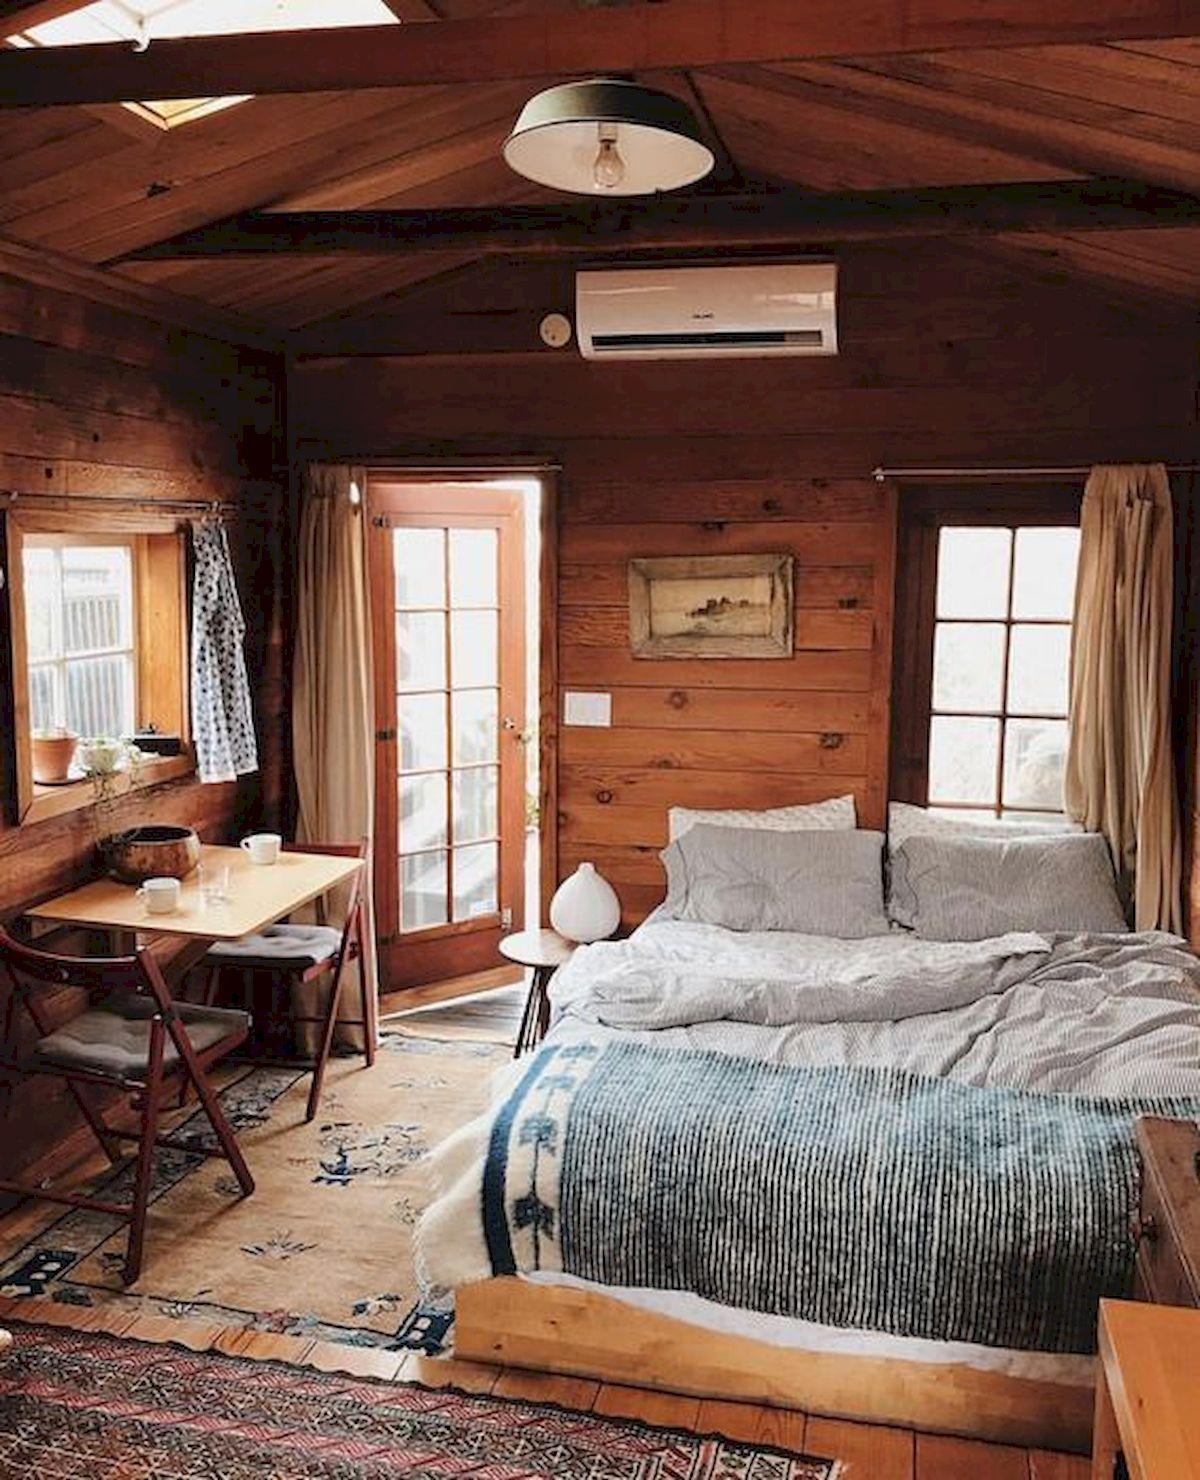 70 Fantastic College Bedroom Decor Ideas And Remodel Worldecor Co Cozy Cabin Bedrooms Cabin Interior Design Cabin Room Design